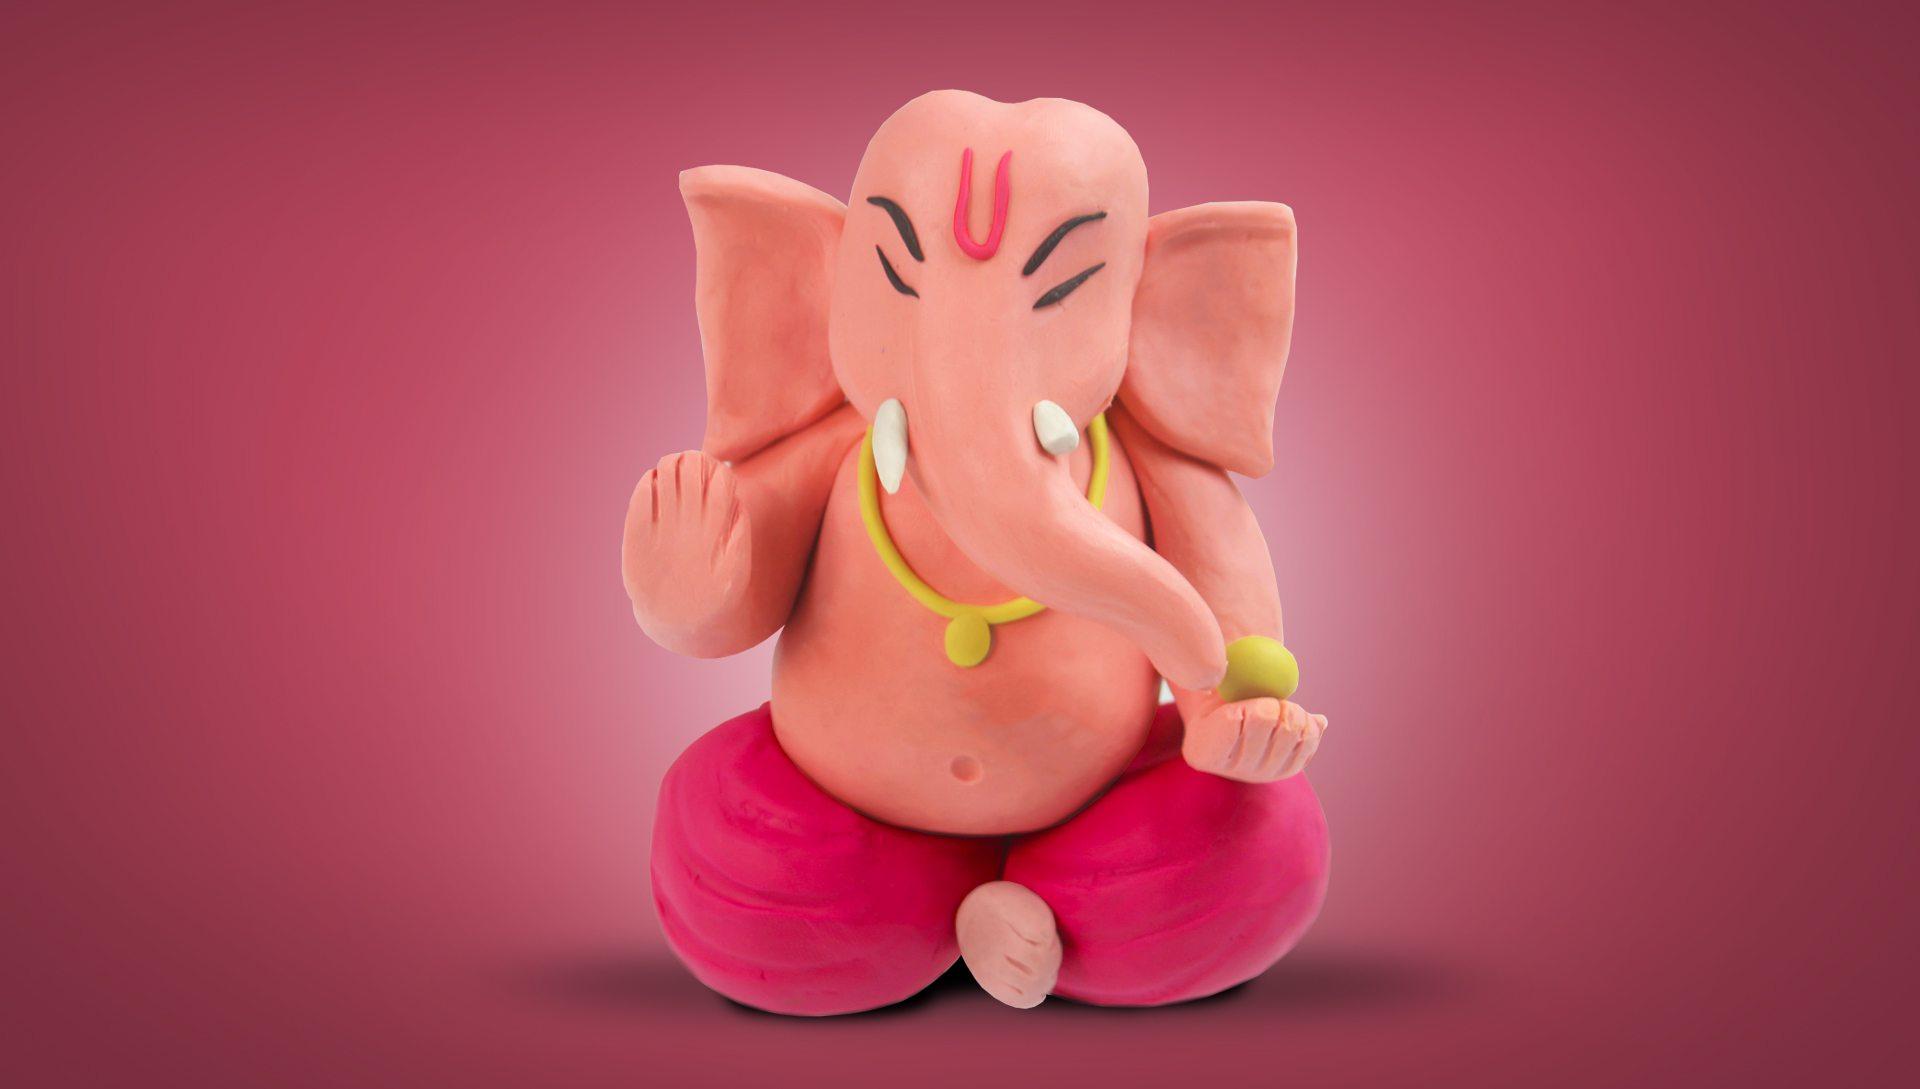 How to Make Ganesh Idol with Play Dough - Kidu Kidu